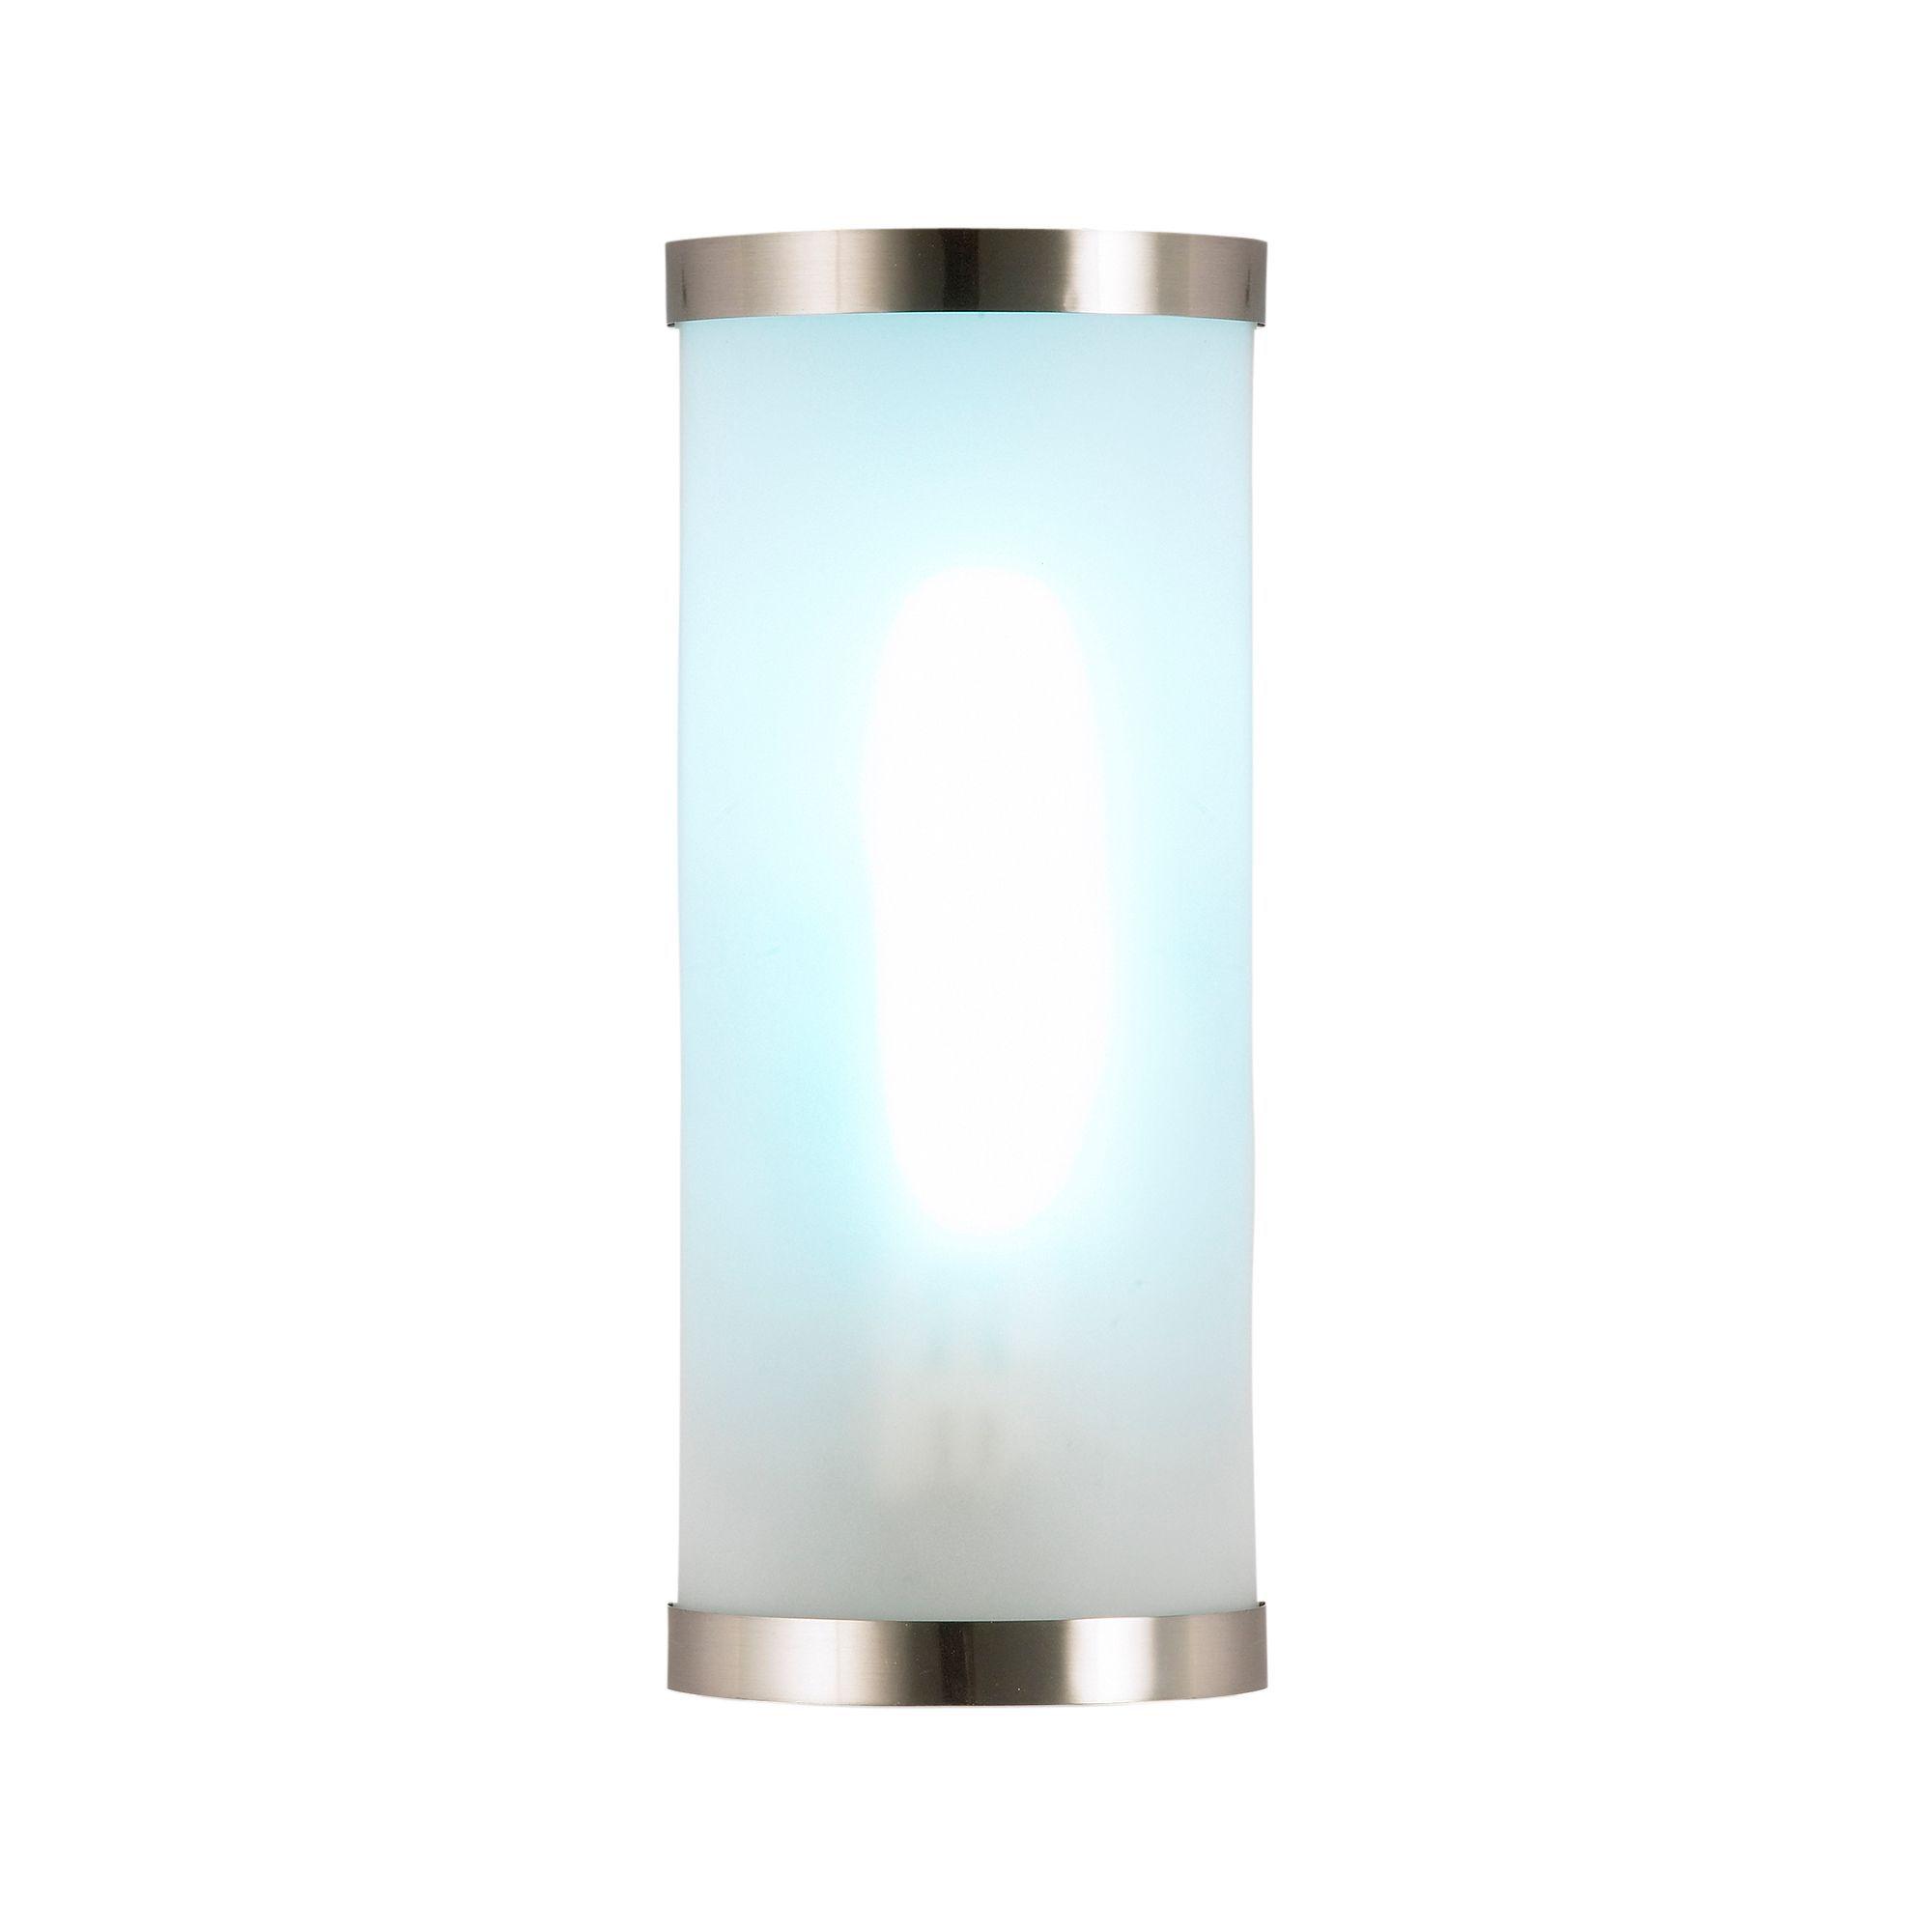 Bain Nickel Effect CFL Pl Bathroom Wall Light Departments DIY At B Q